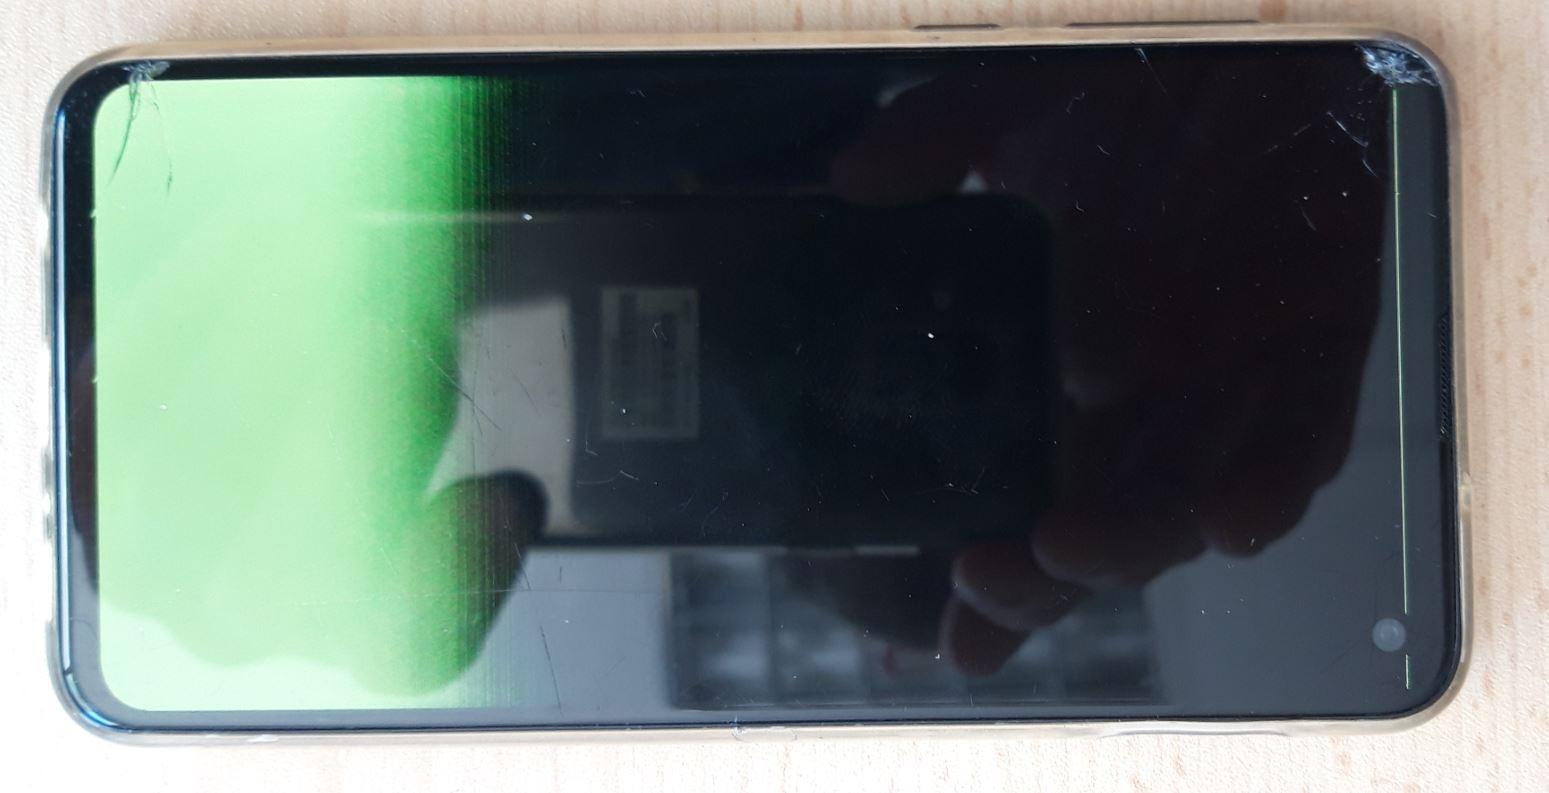 Casse Portable S10e Grangier Boris.jpg